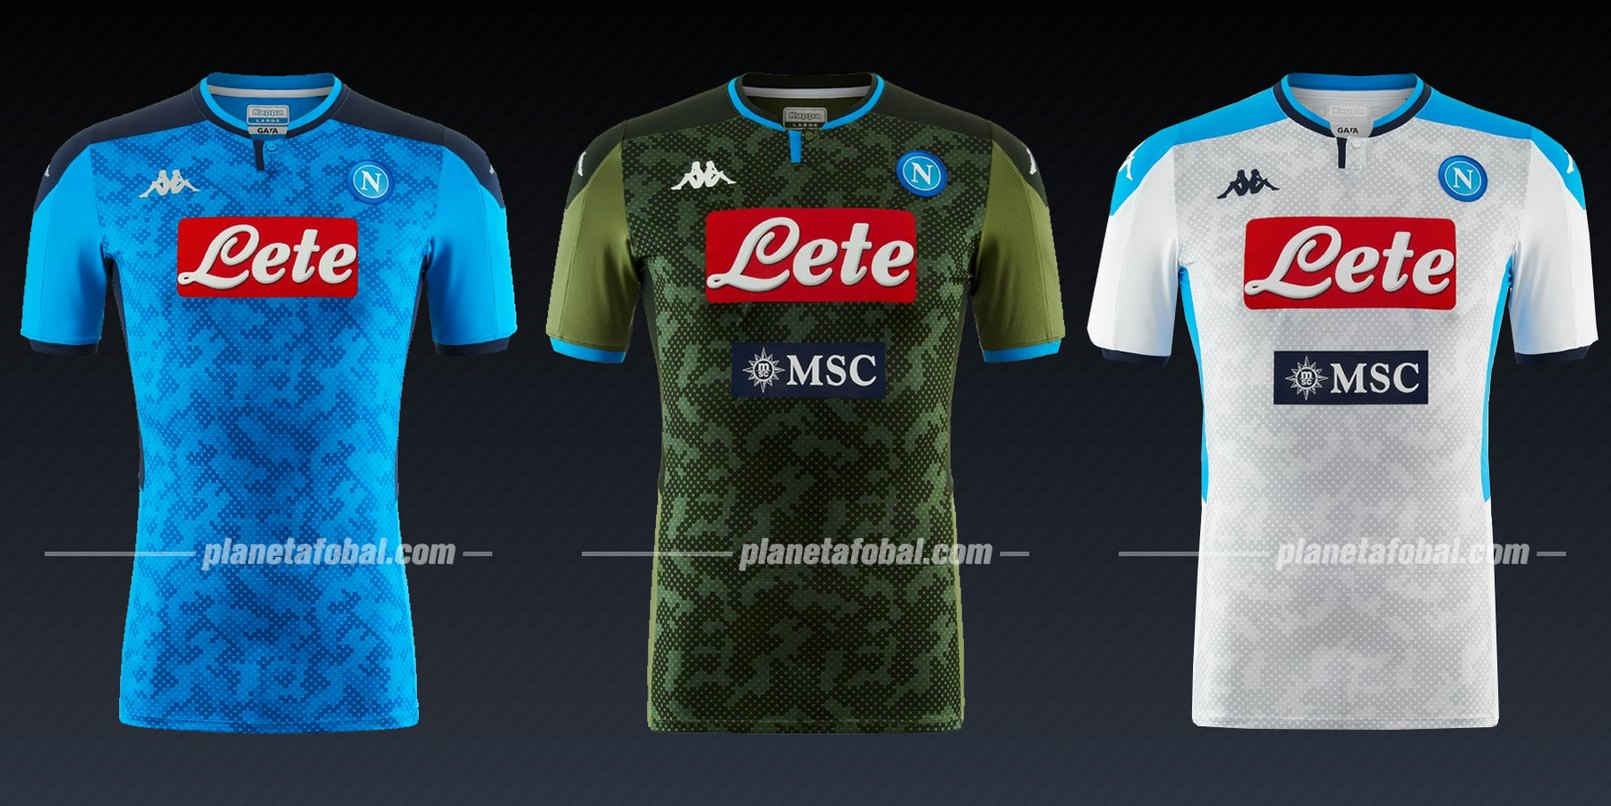 Napoli (Kappa) | Camisetas de la Liga de Campeones 2019/20